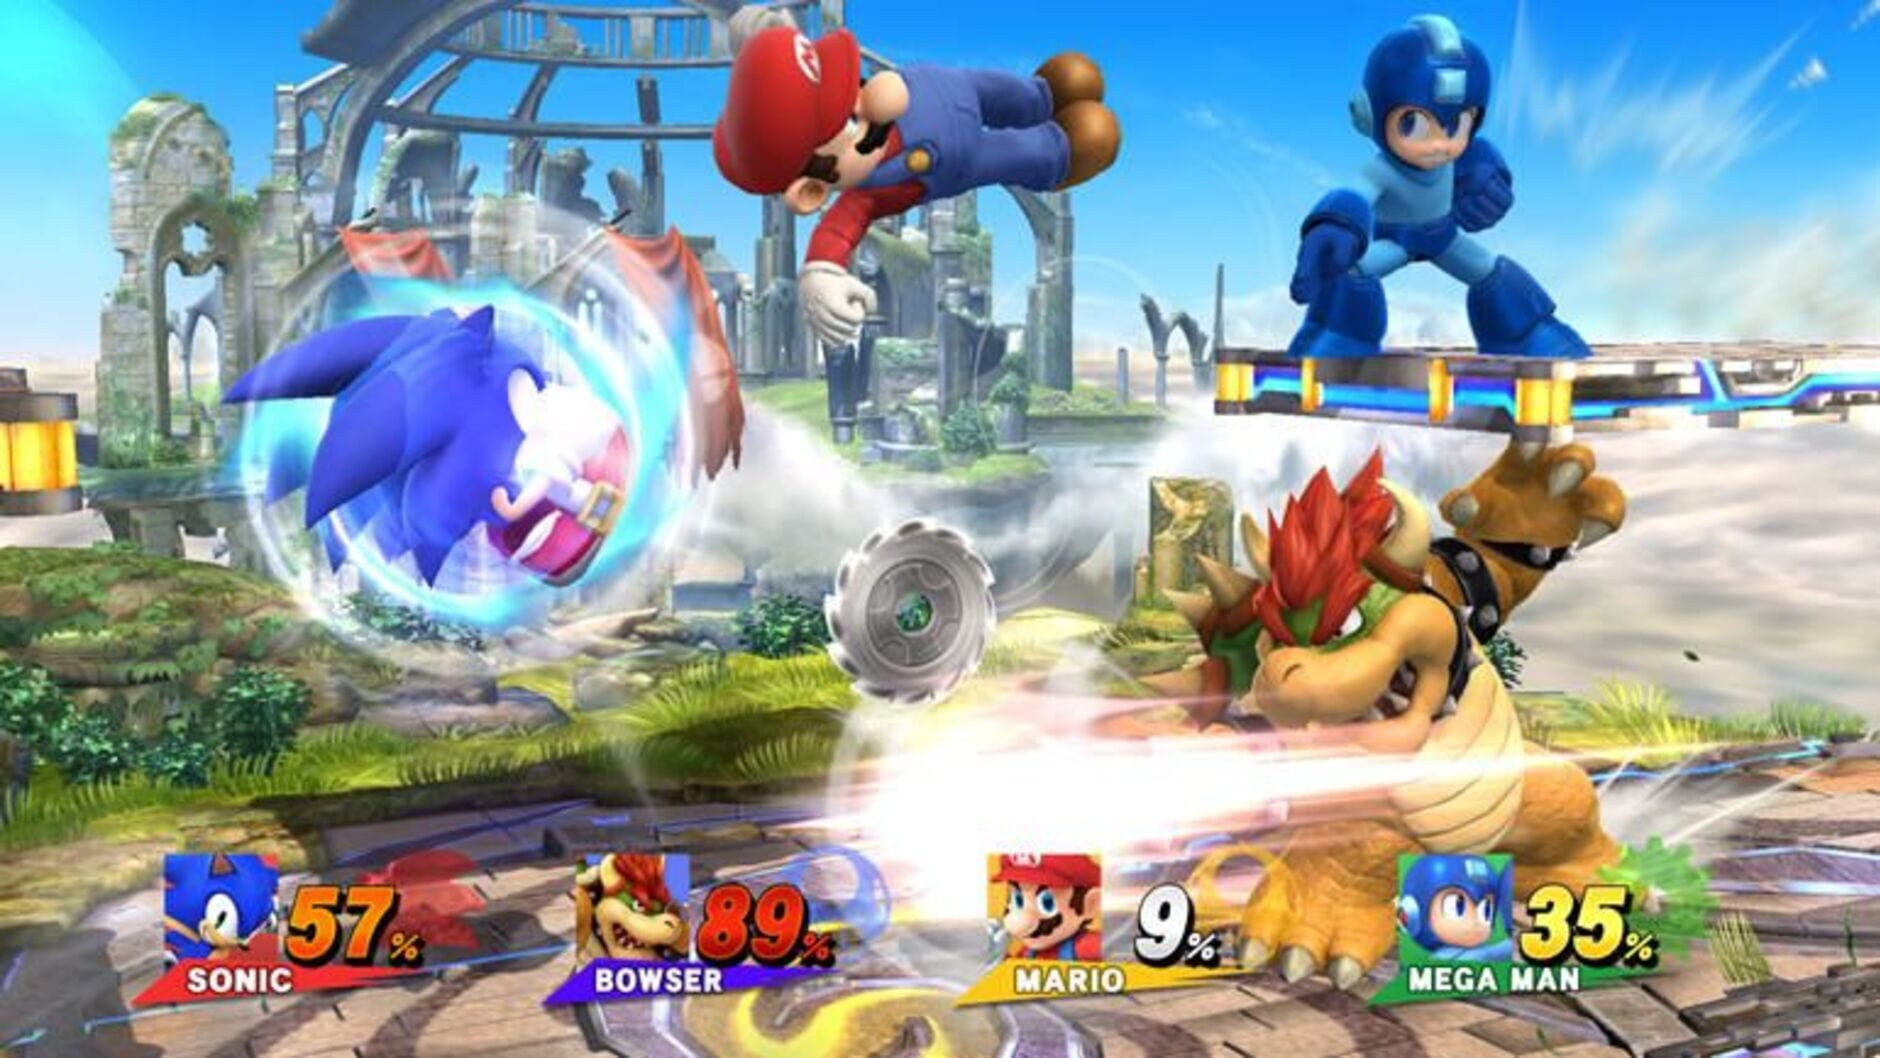 Super Smash Bros. for Wii U - 3